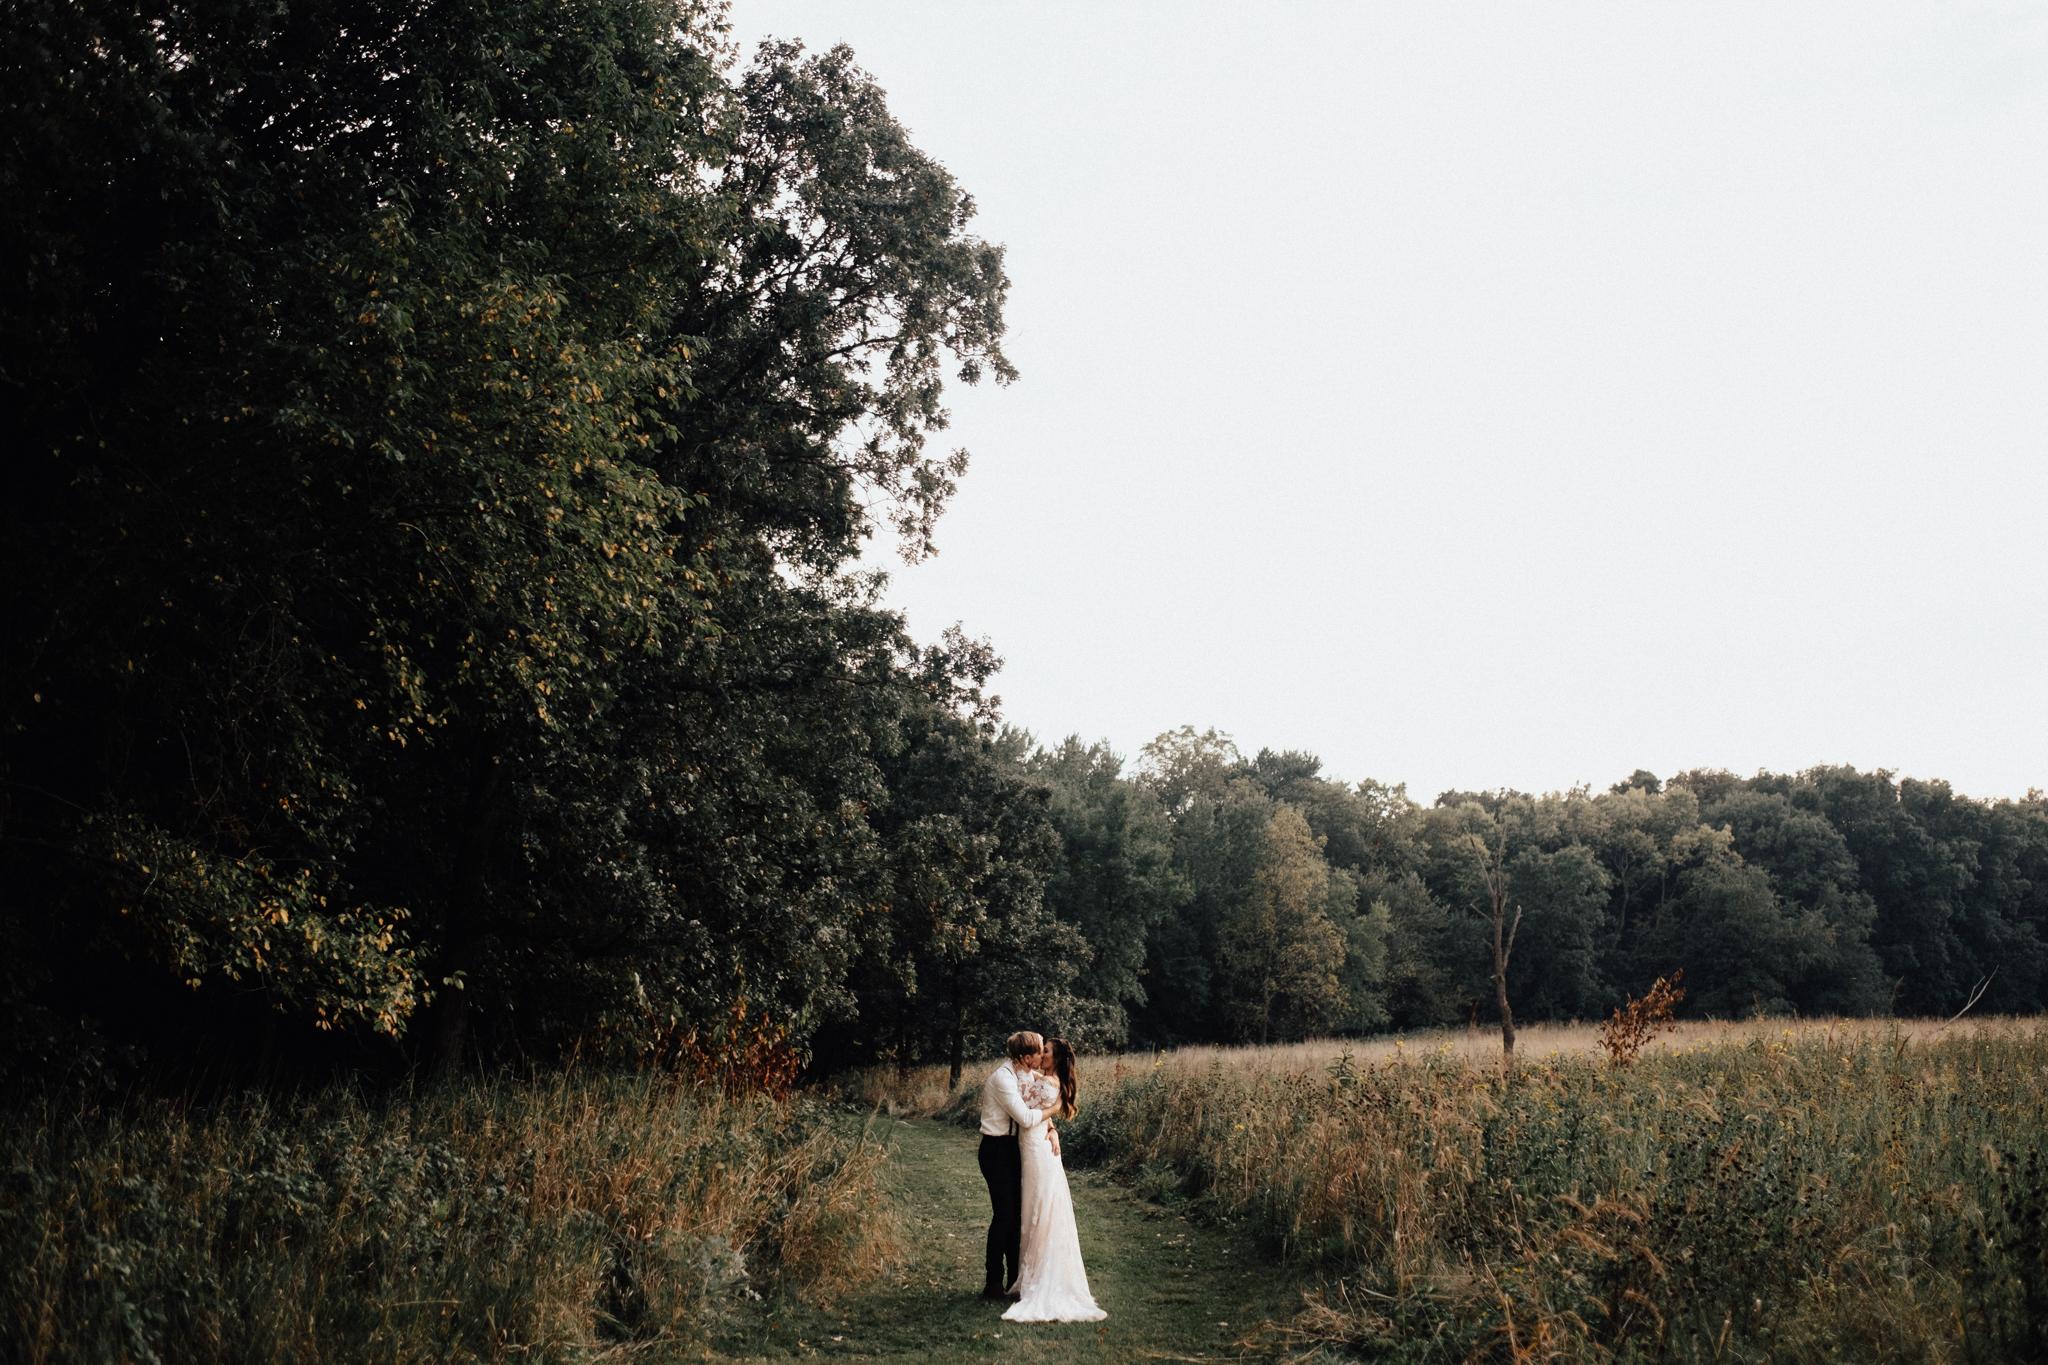 Arizona-Adventure-Elopement-Wedding-Photographer-119.jpg